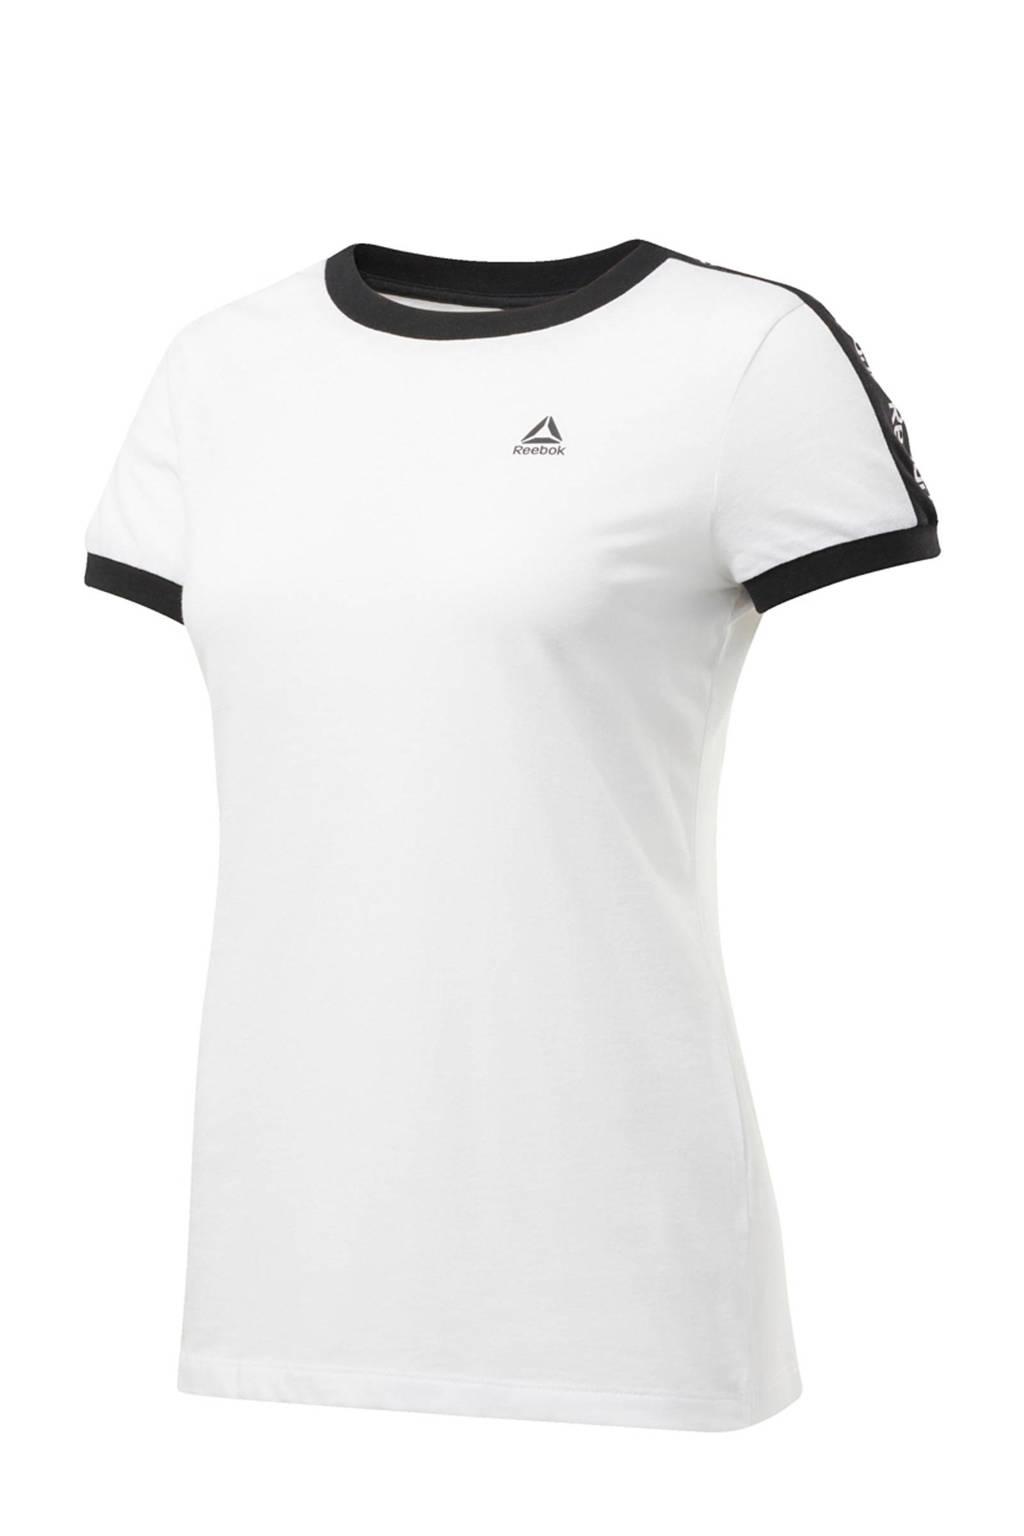 Reebok sport T-shirt wit, Wit/zwart